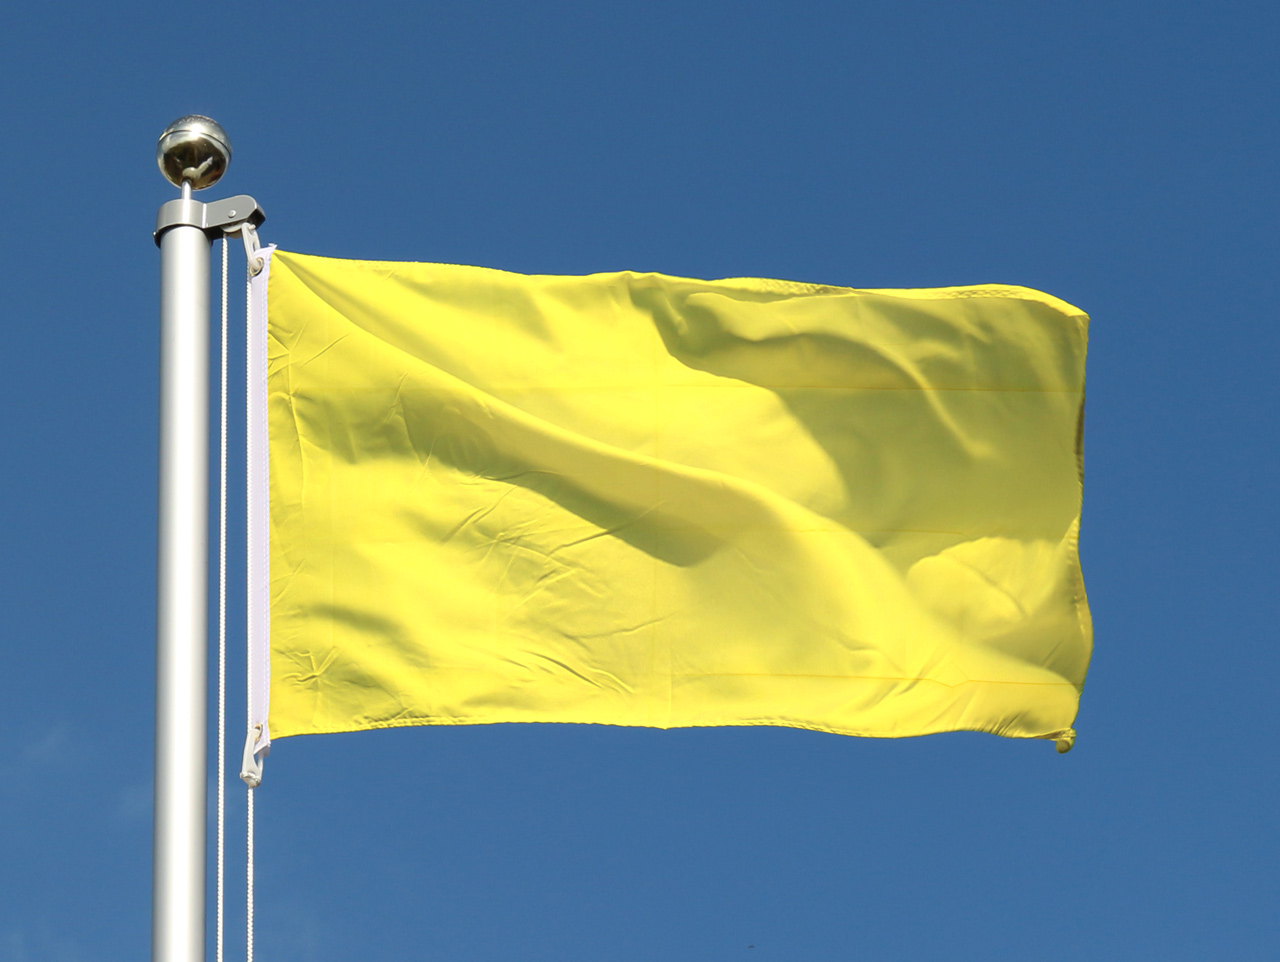 Günstige Gelbe Flagge - 60 x 90 cm - FlaggenPlatz.de